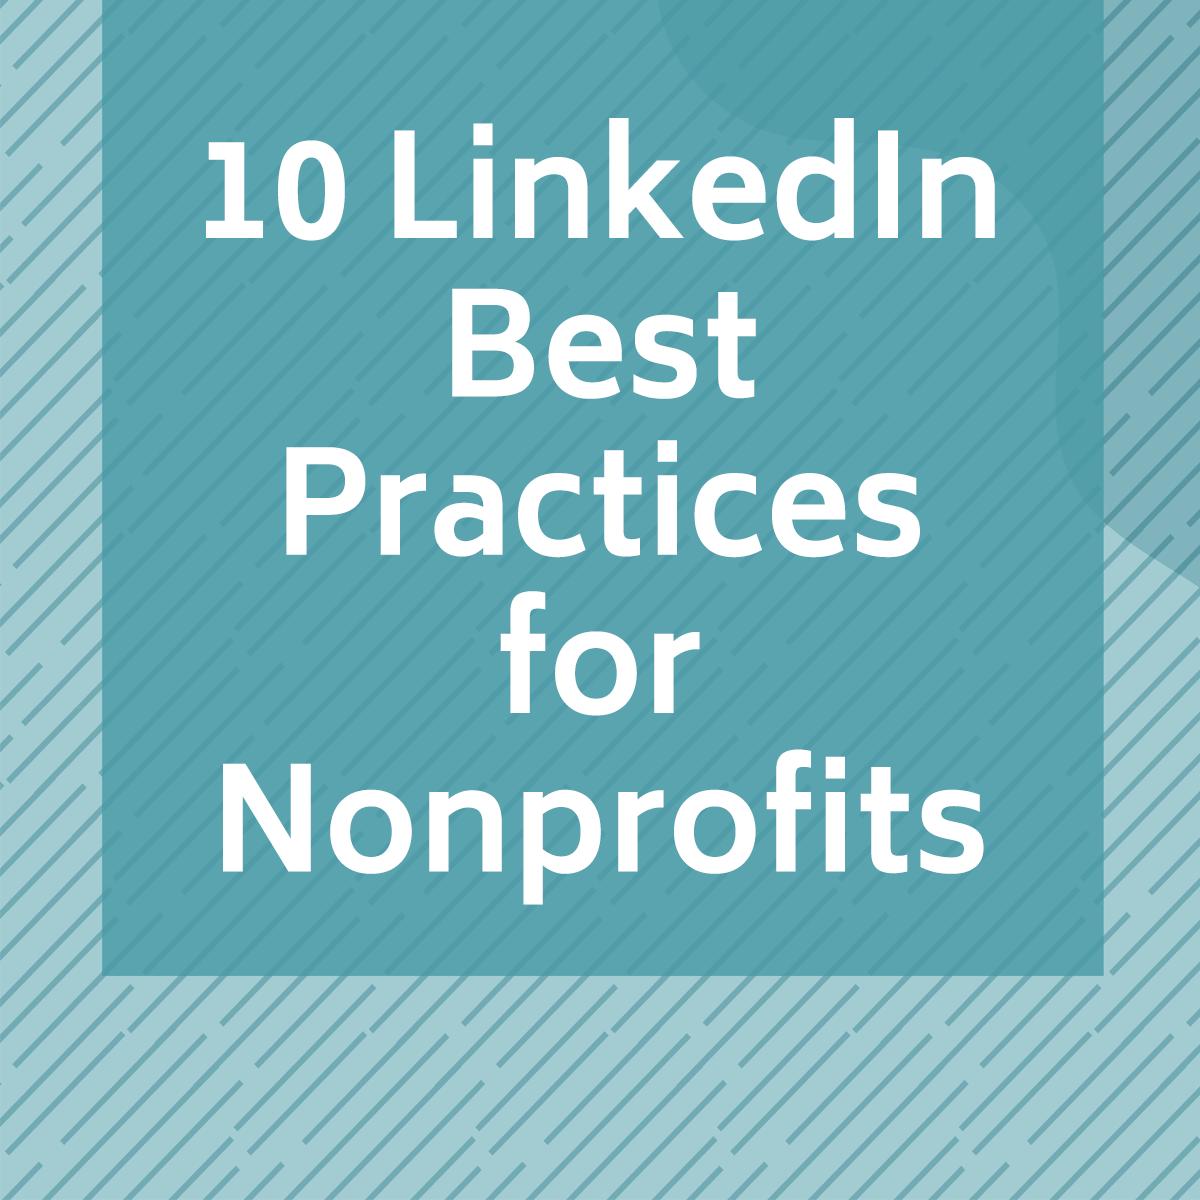 10 LinkedIn Best Practices for Nonprofits